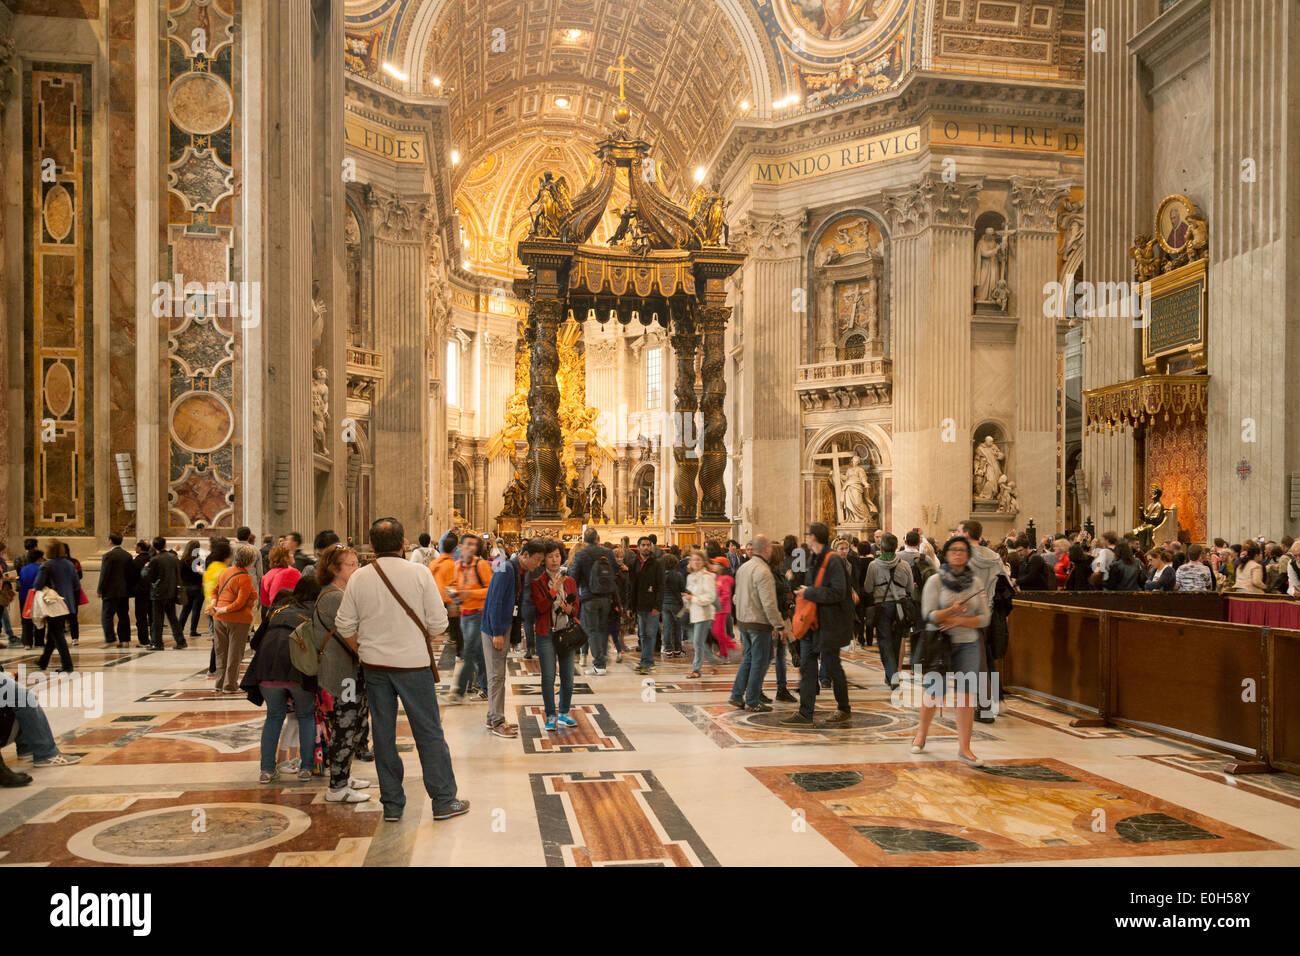 https://c8.alamy.com/compde/e0h58y/interieur-str-peters-basilica-kirche-vatikan-rom-italien-europa-e0h58y.jpg